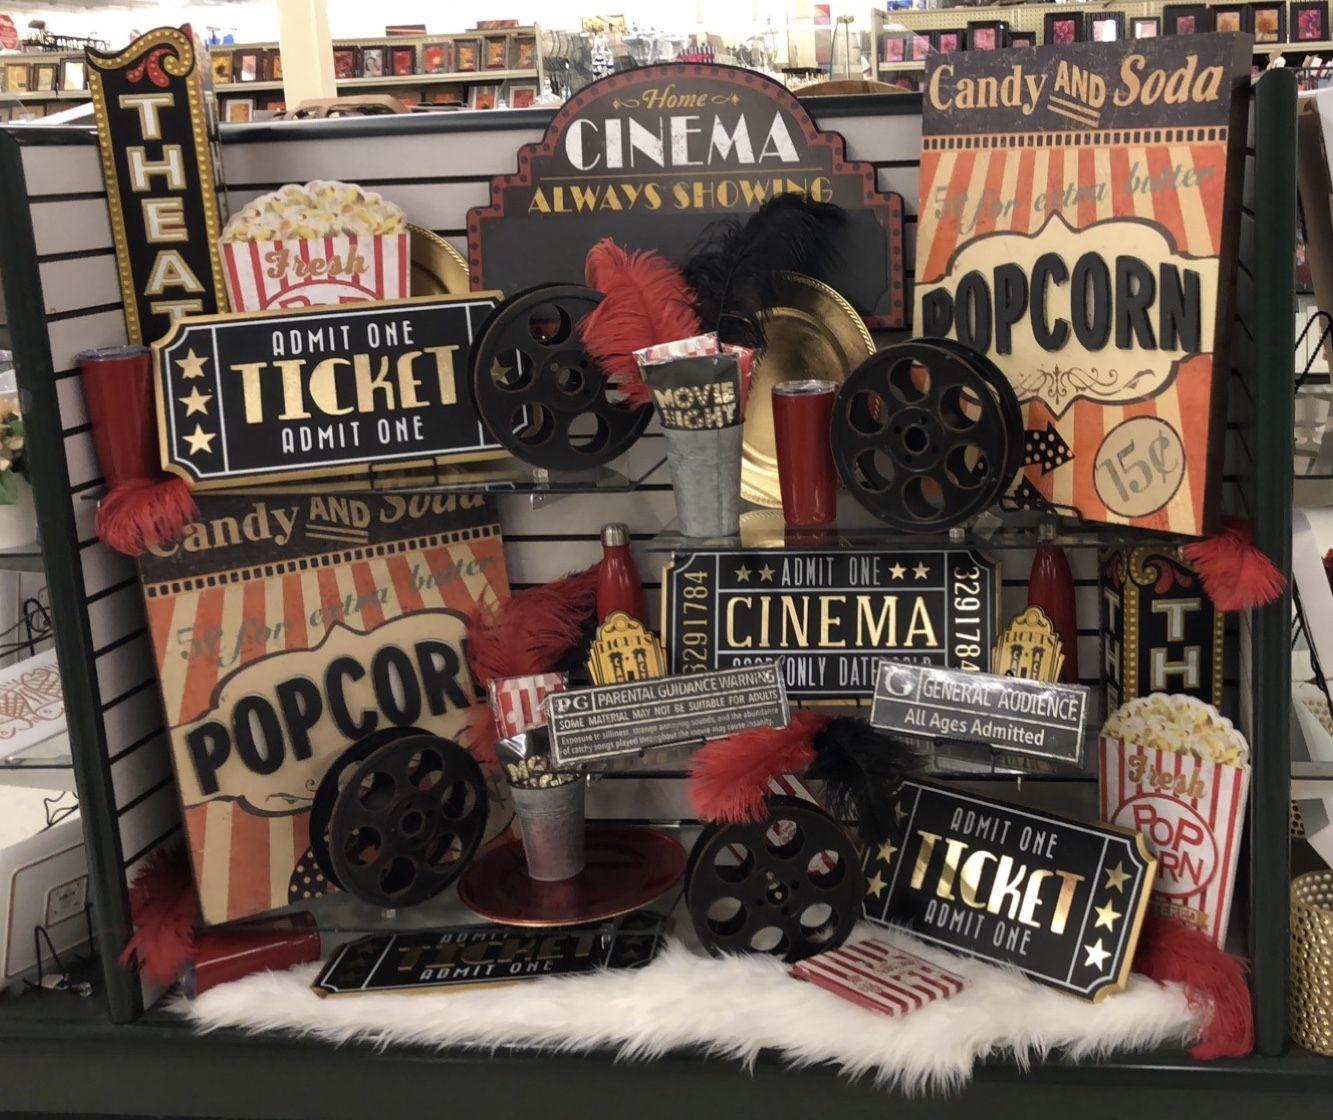 Theater Room Ideas Best 25 Theater Rooms Ideas On: Movie Decor, Theater Room Decor